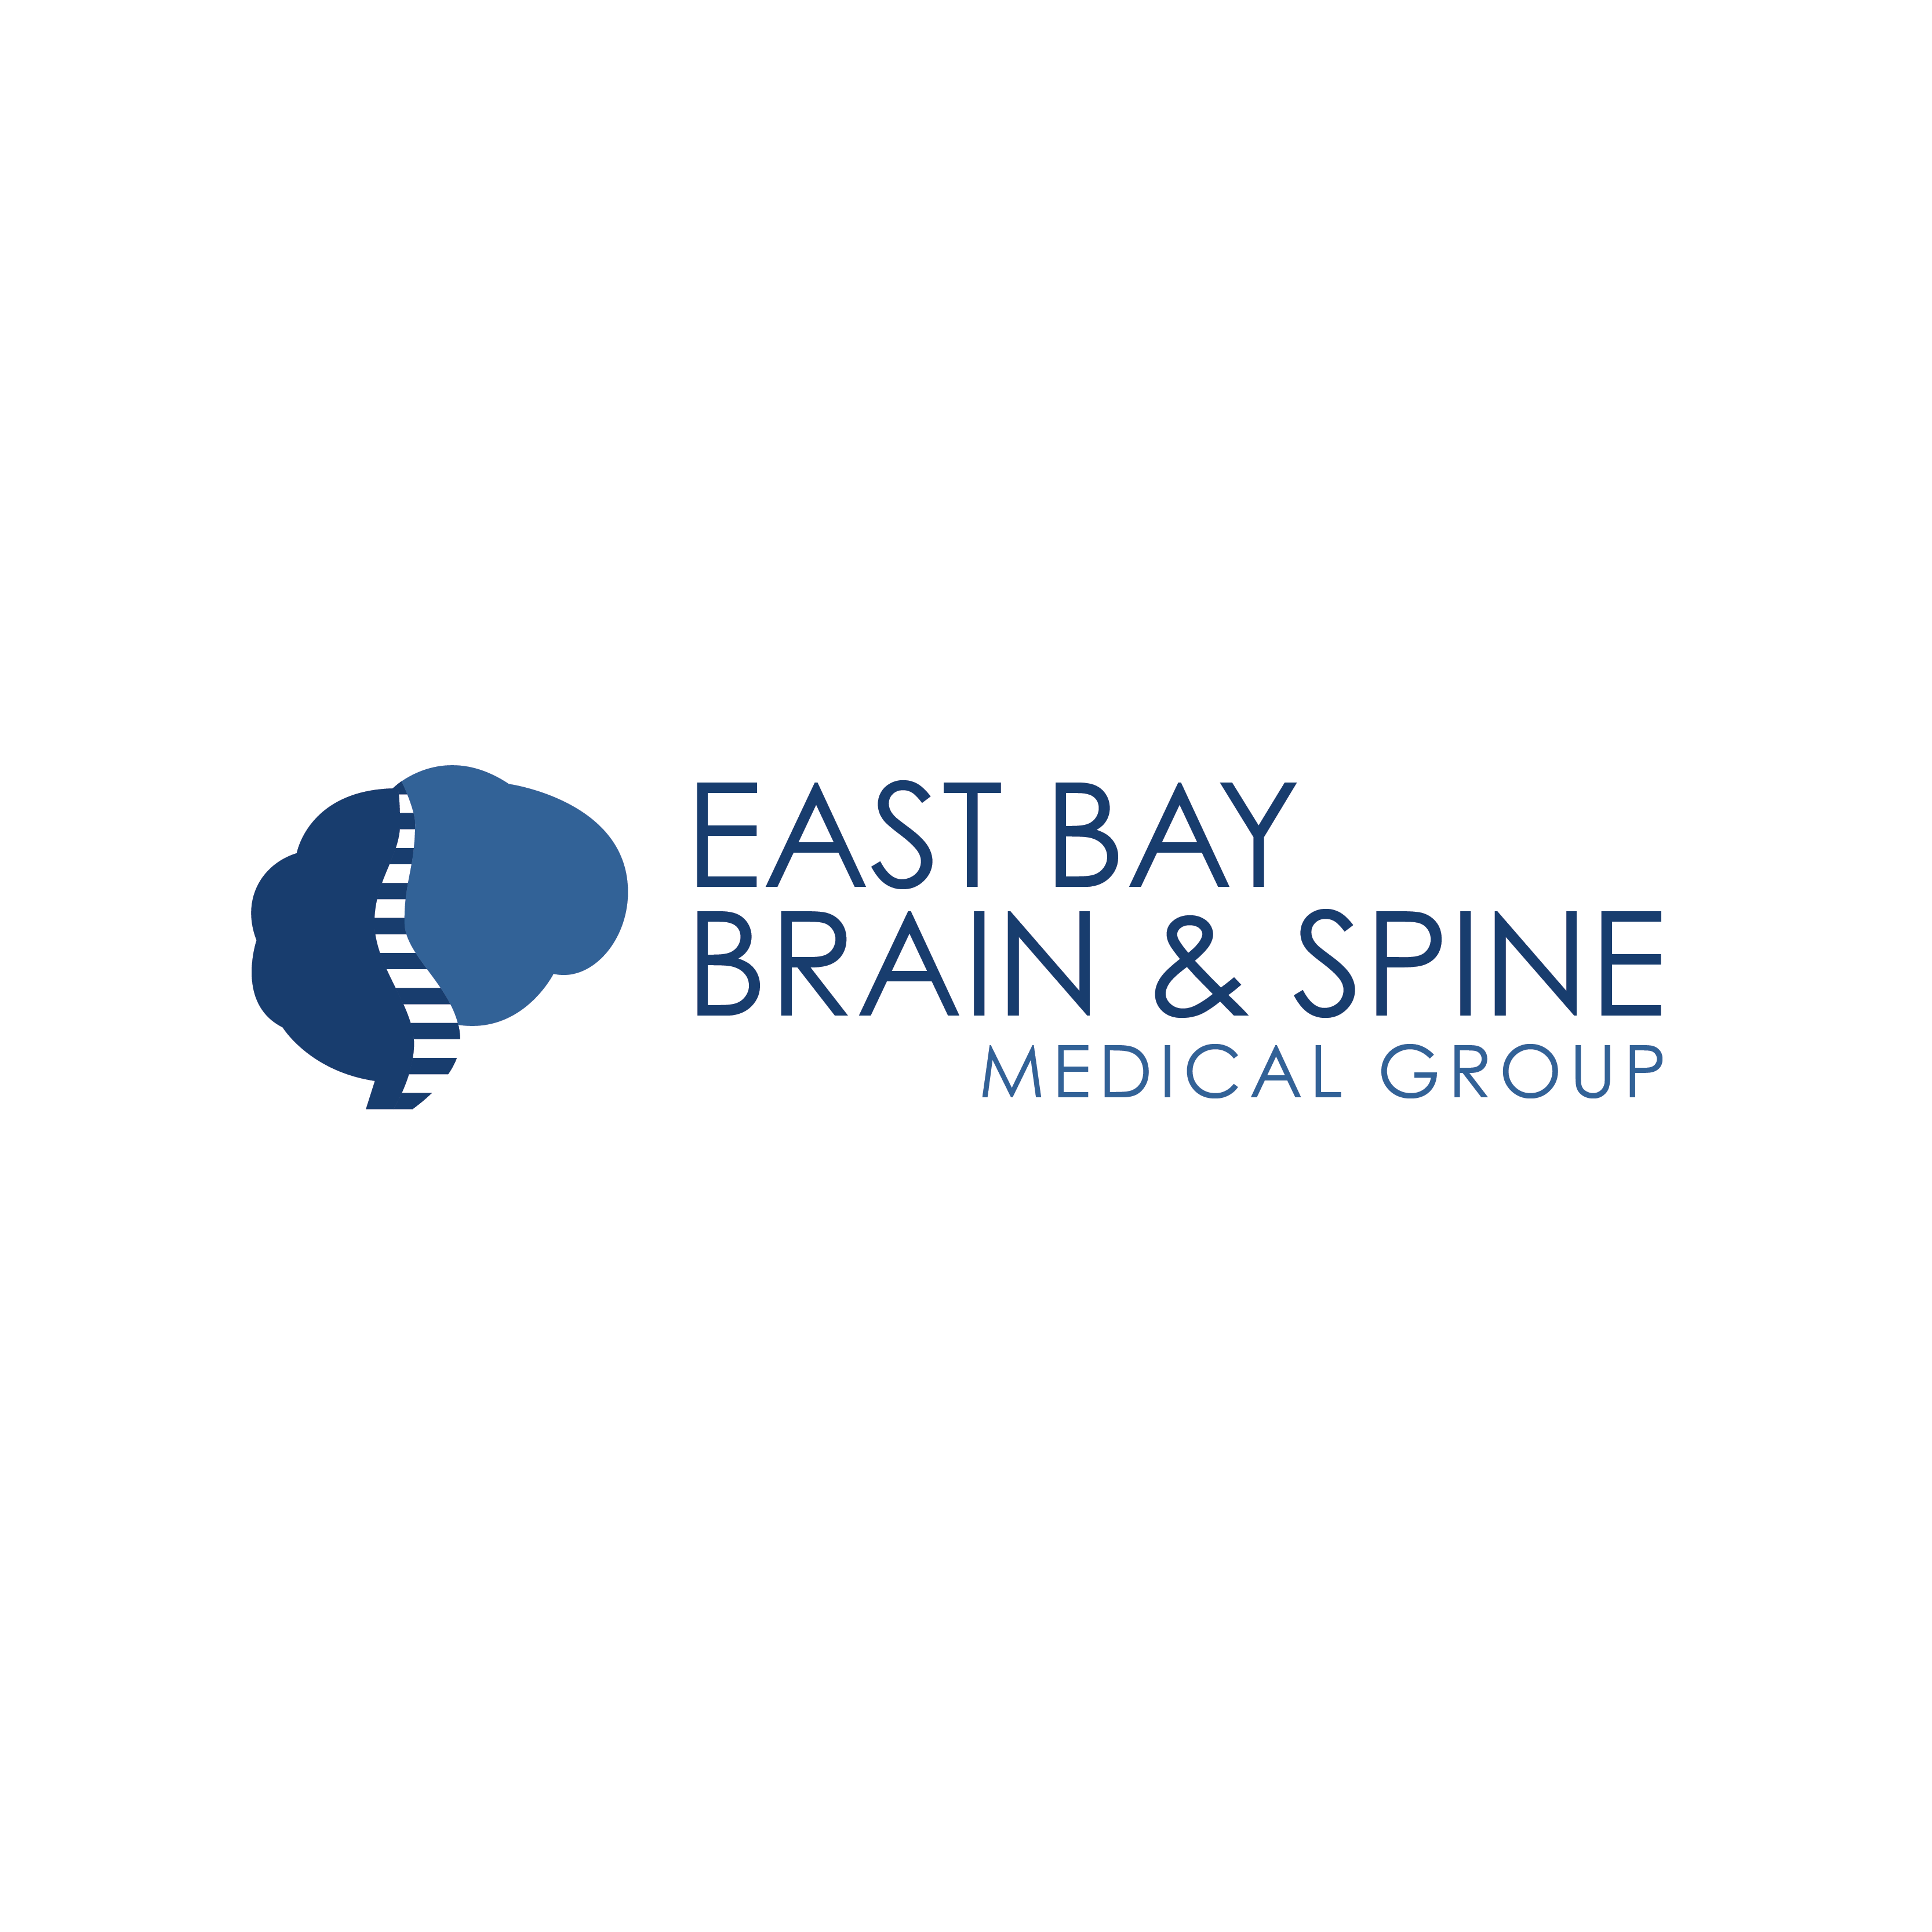 East Bay Brain & Spine Medical Group Logo